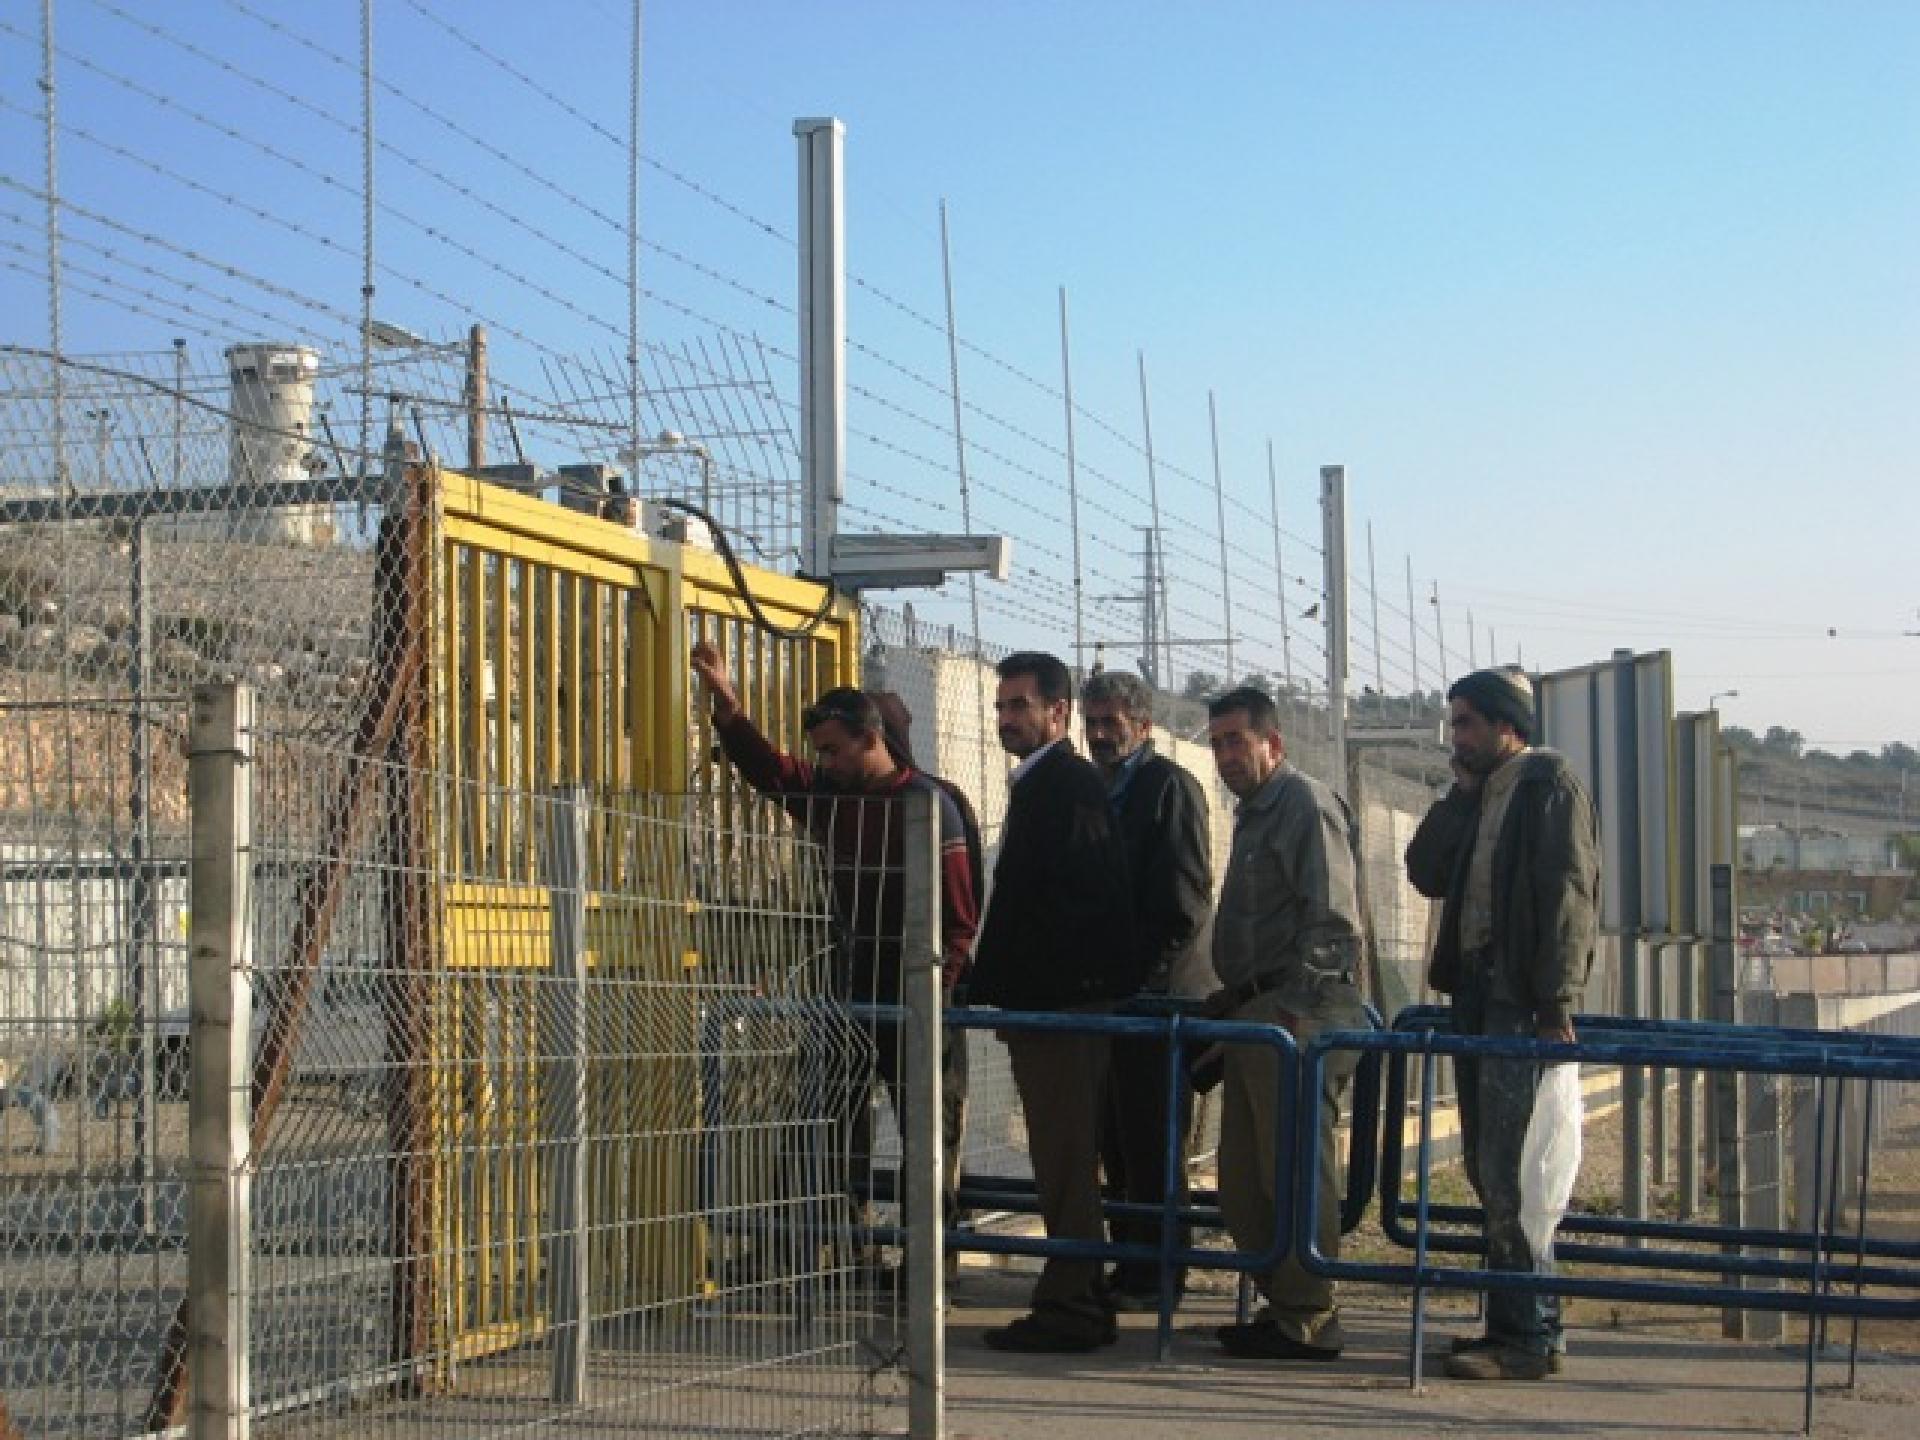 Barta'a/Reikhan checkpoint 26.11.09